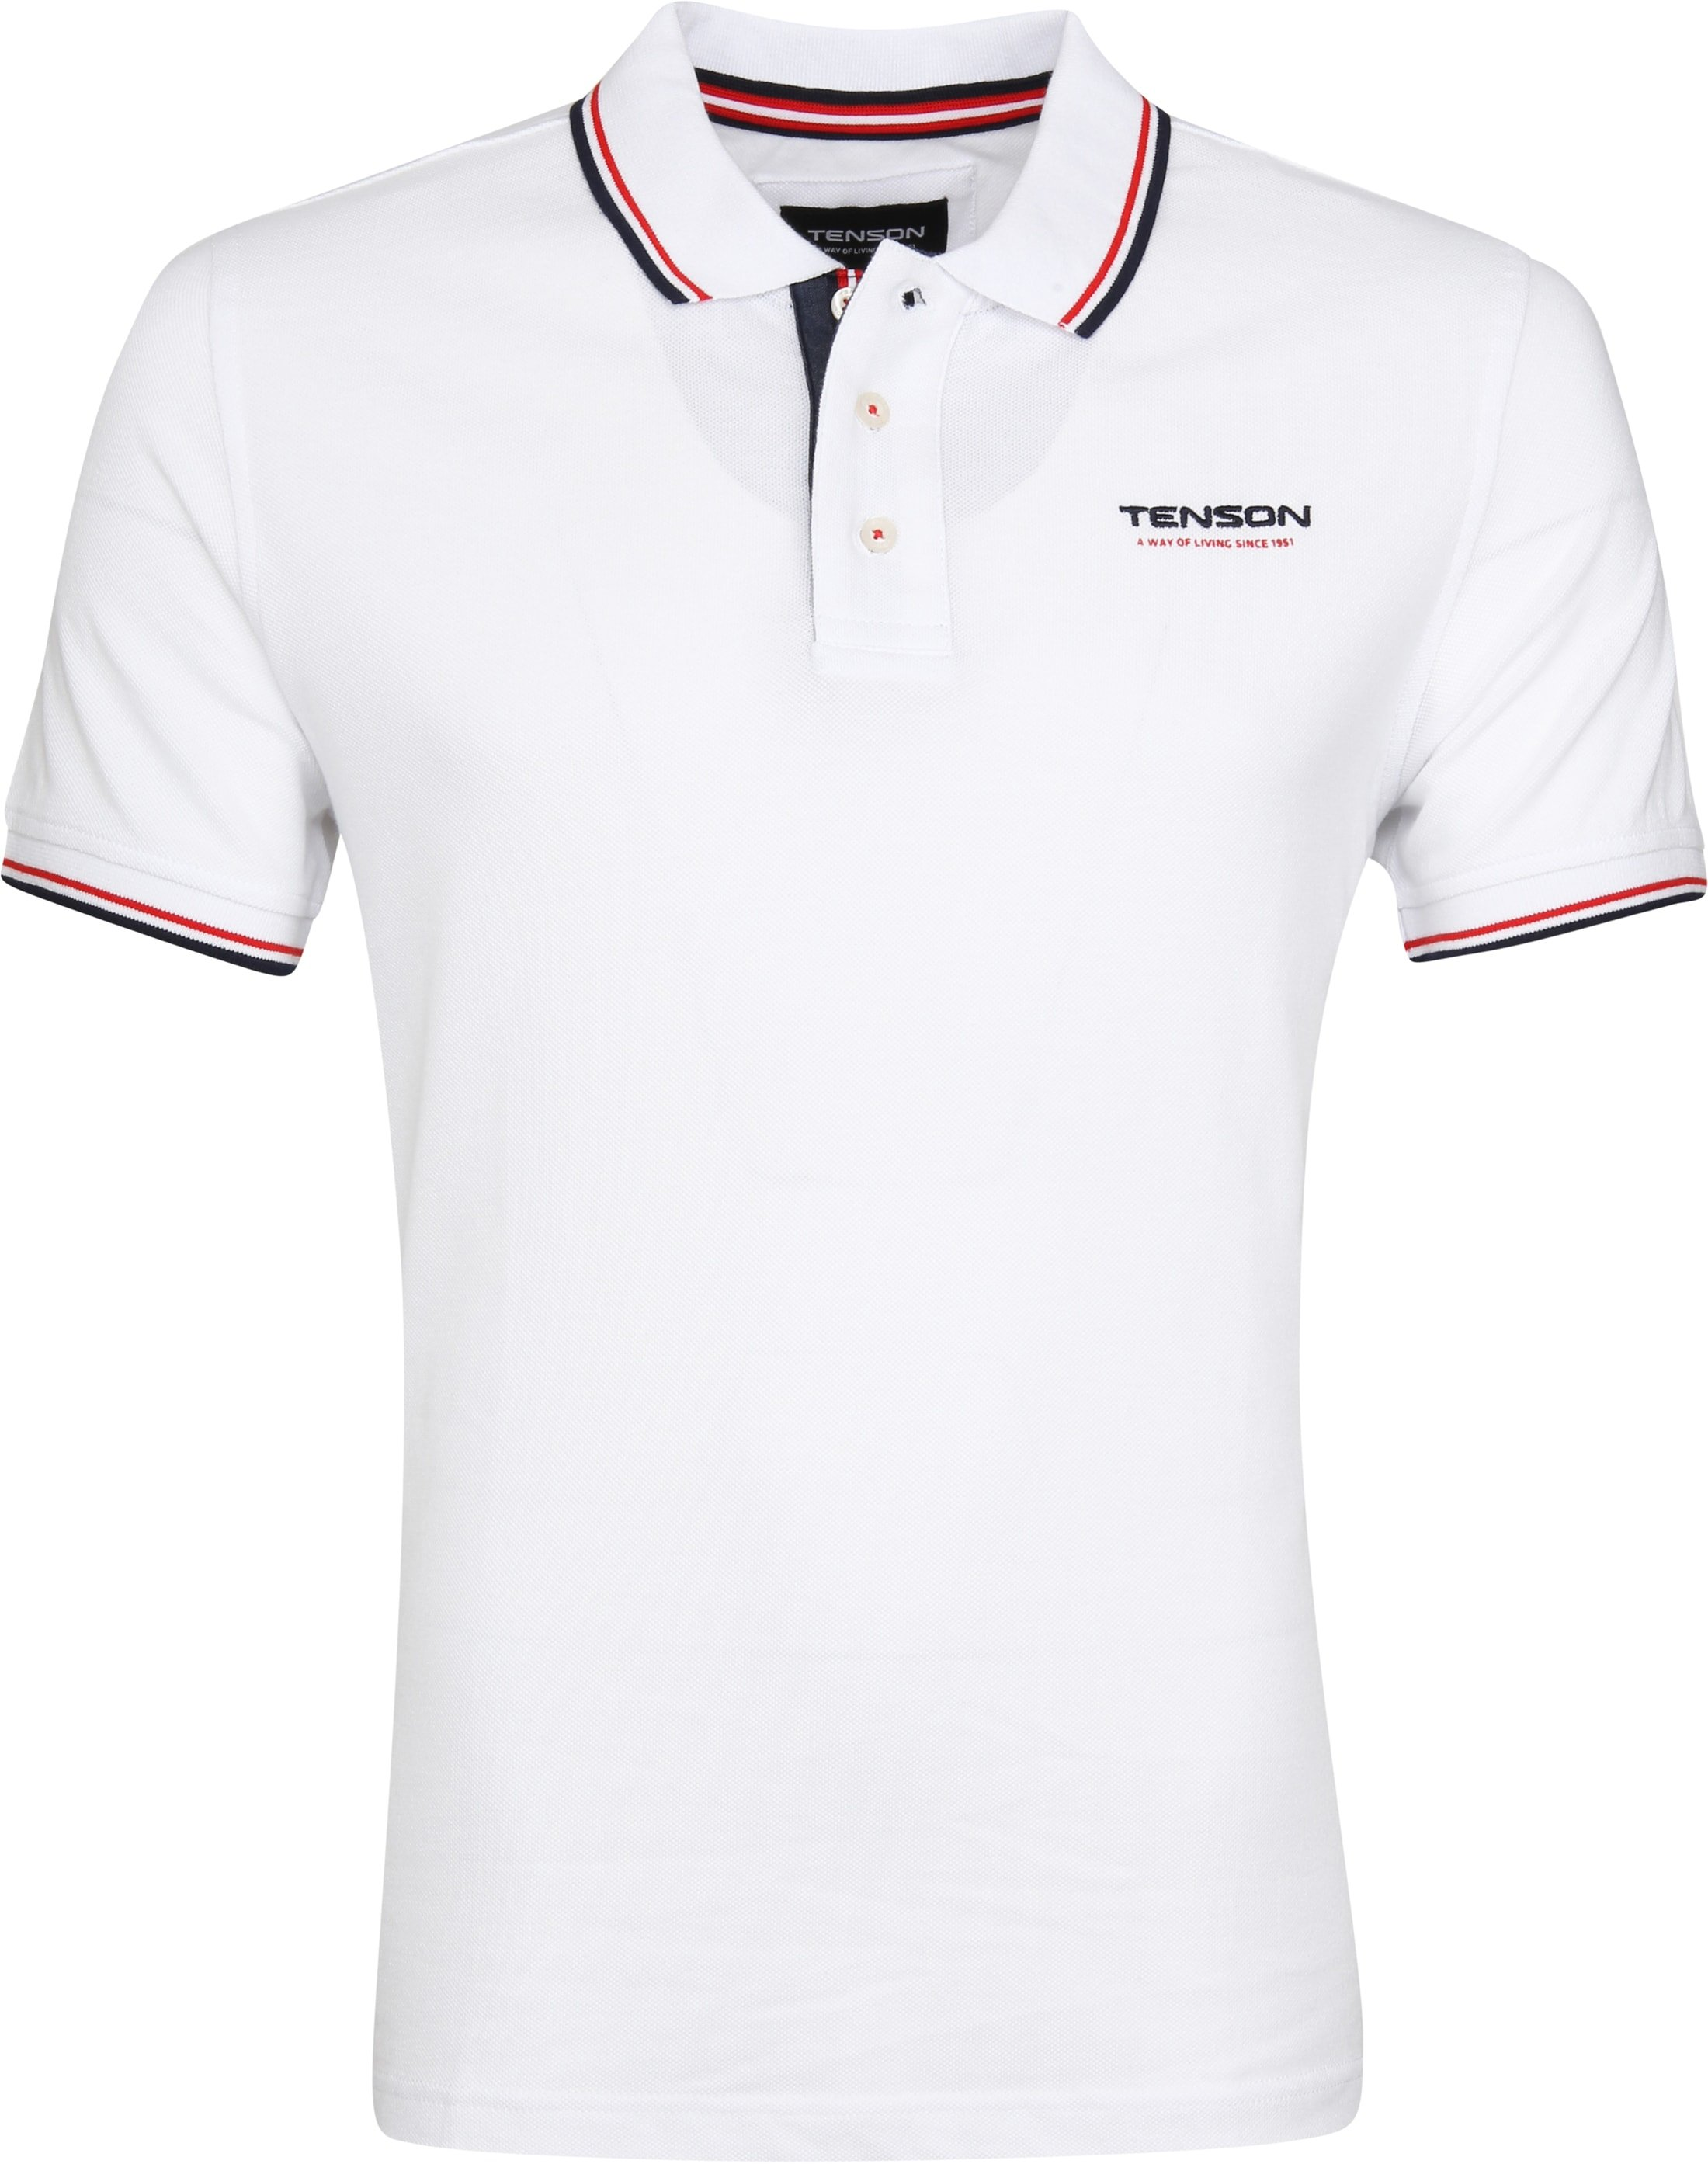 Tenson Poloshirt Barney Weiß foto 0